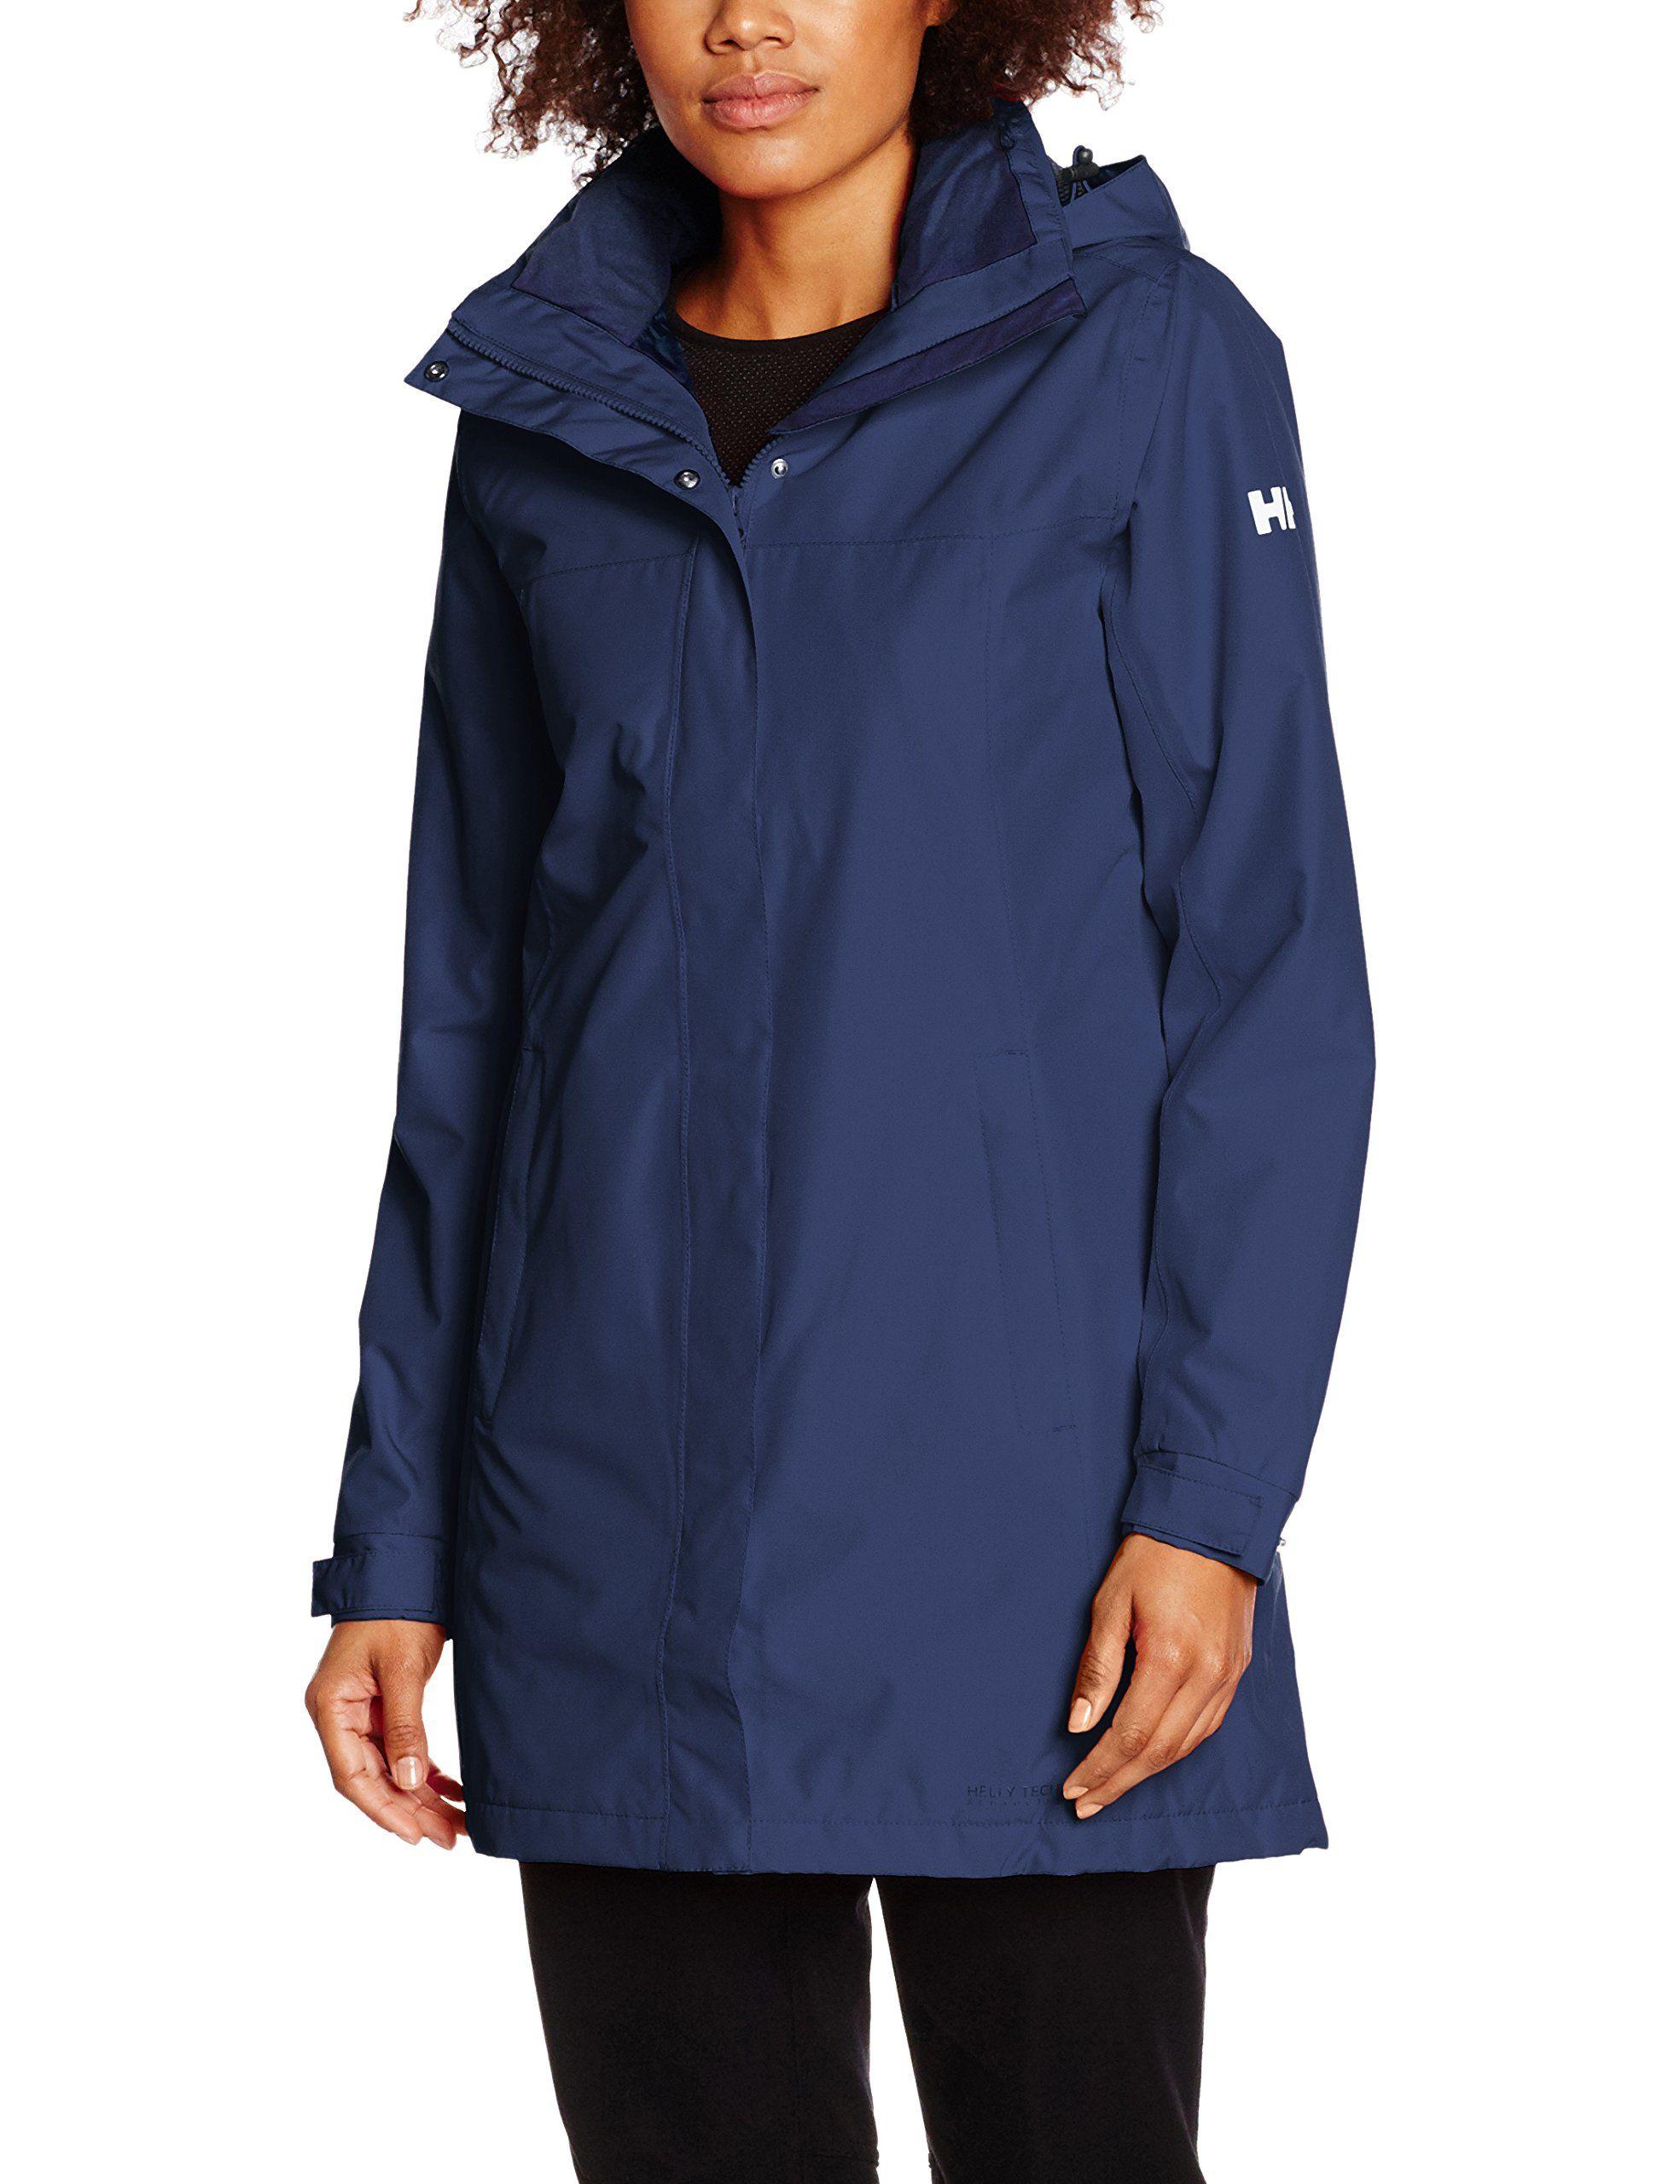 Helly Hansen Women S Aden Long Insulated Rain Jacket Evening Blue Large Hellytech Protection W Insulated Rain Jacket Raincoat Jacket Womens Fashion Jackets